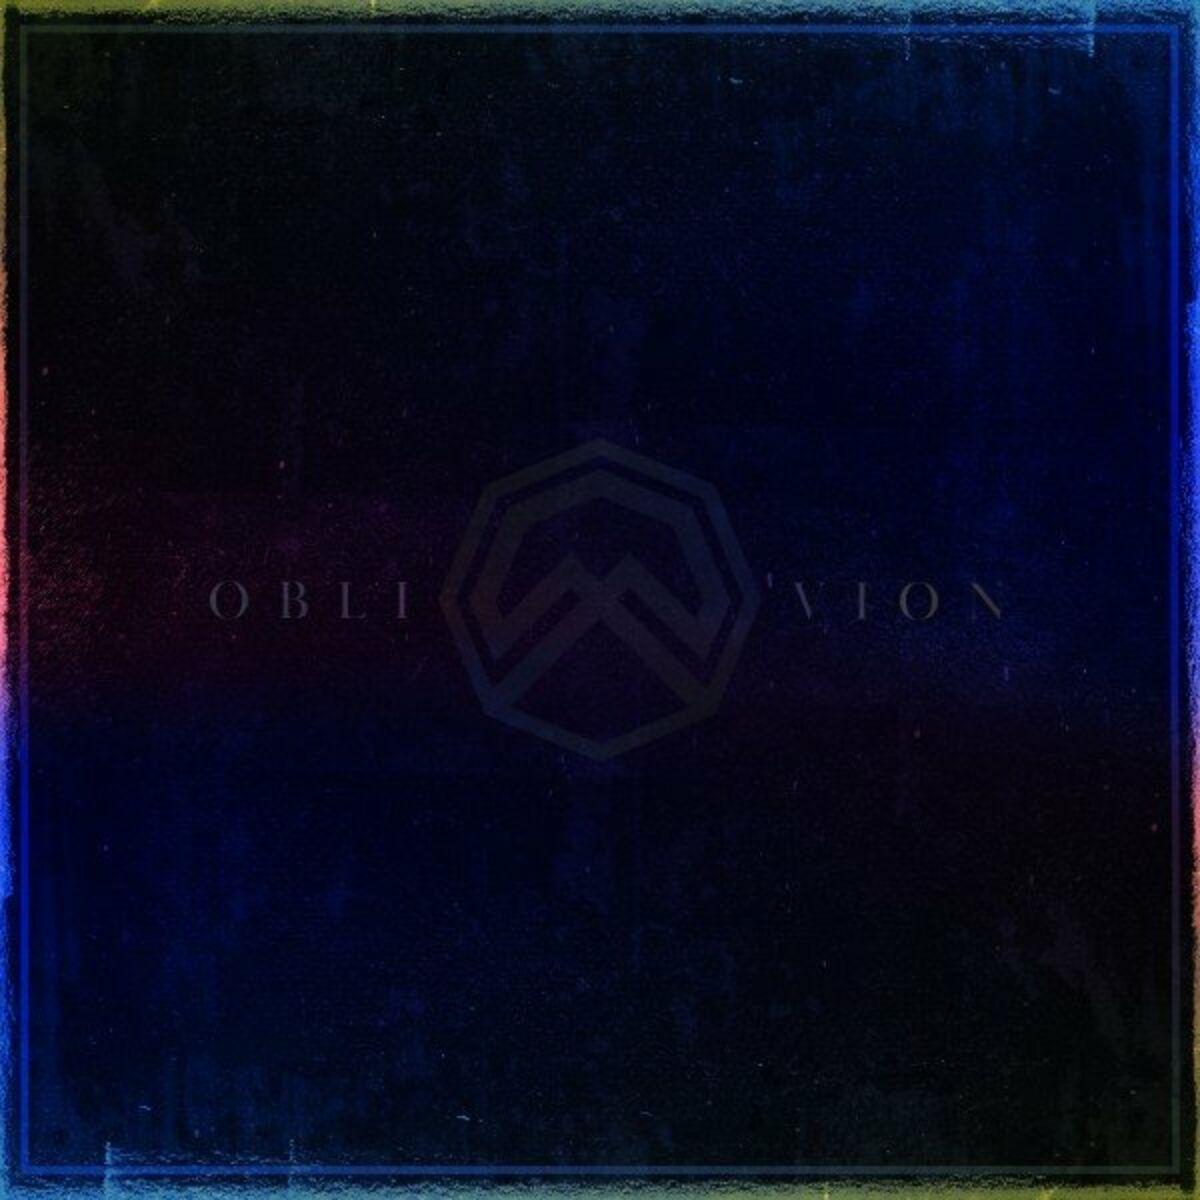 Aviana - Oblivion [single] (2021)